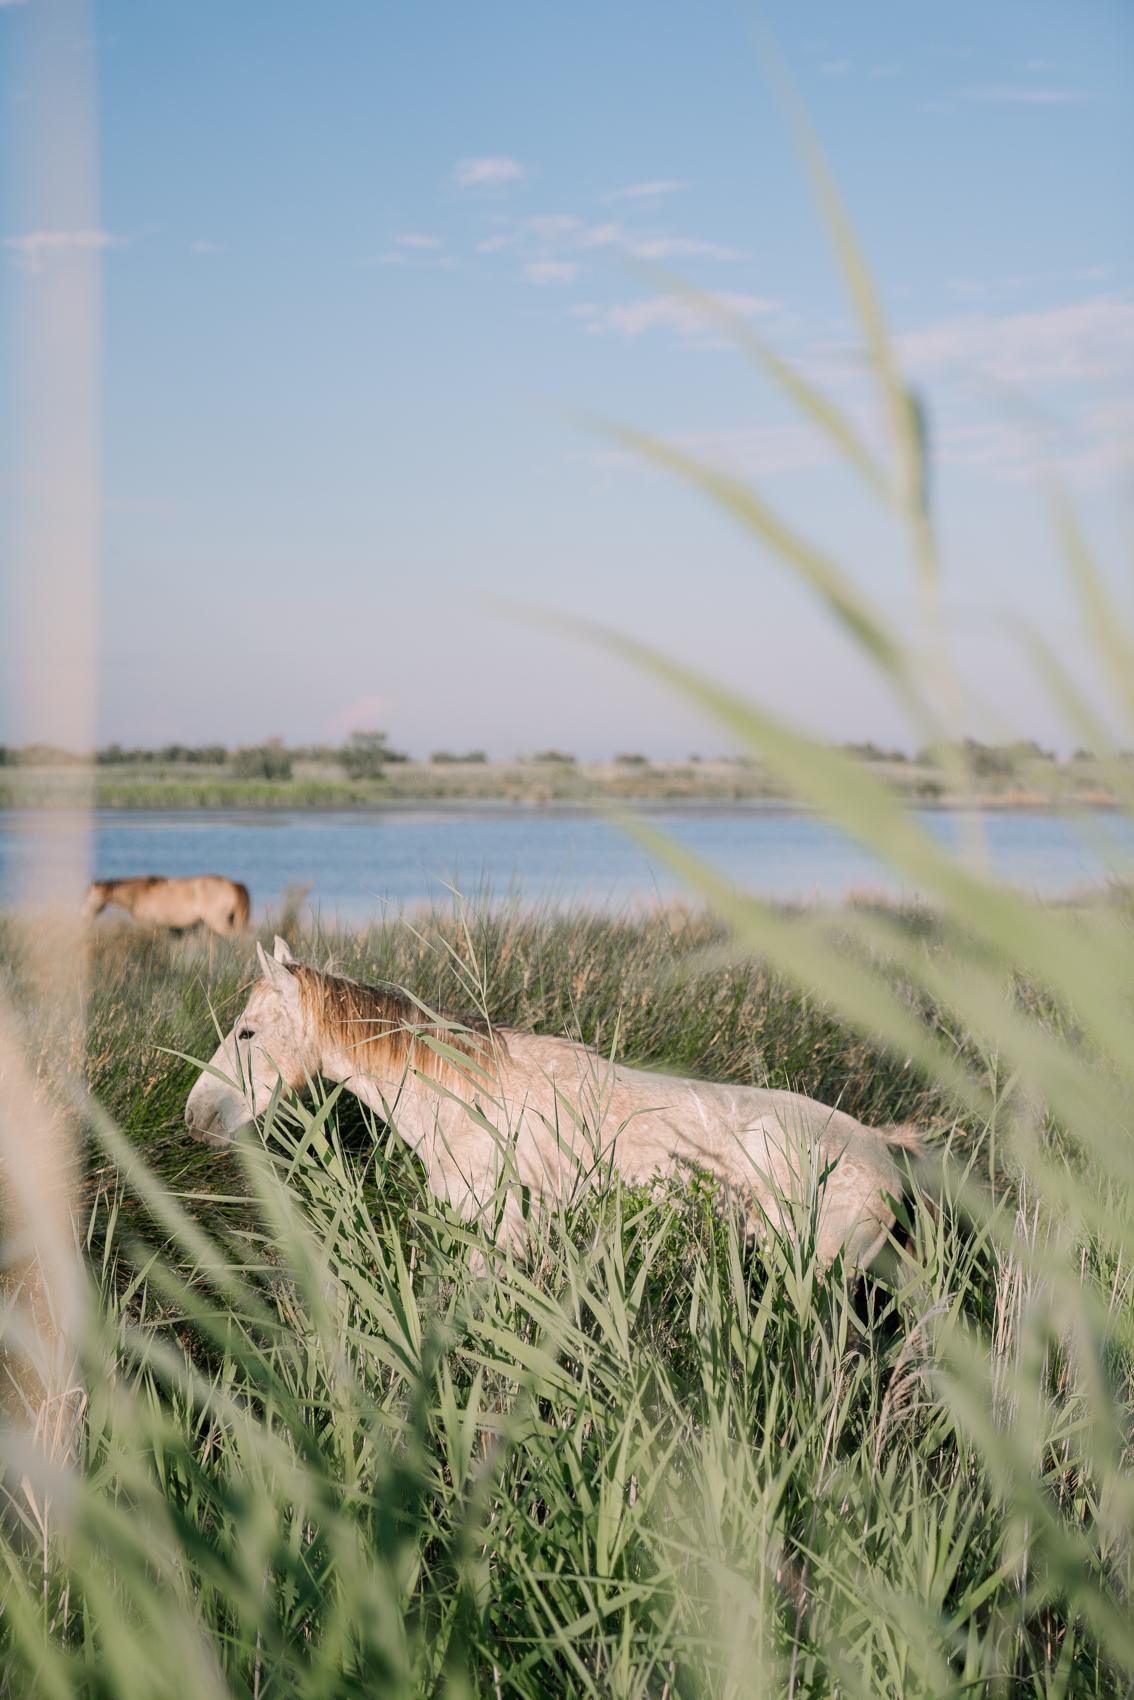 TRAVEL-Photography-provence-wild-horses-nature-camargue-Clara-Tuma.jpg